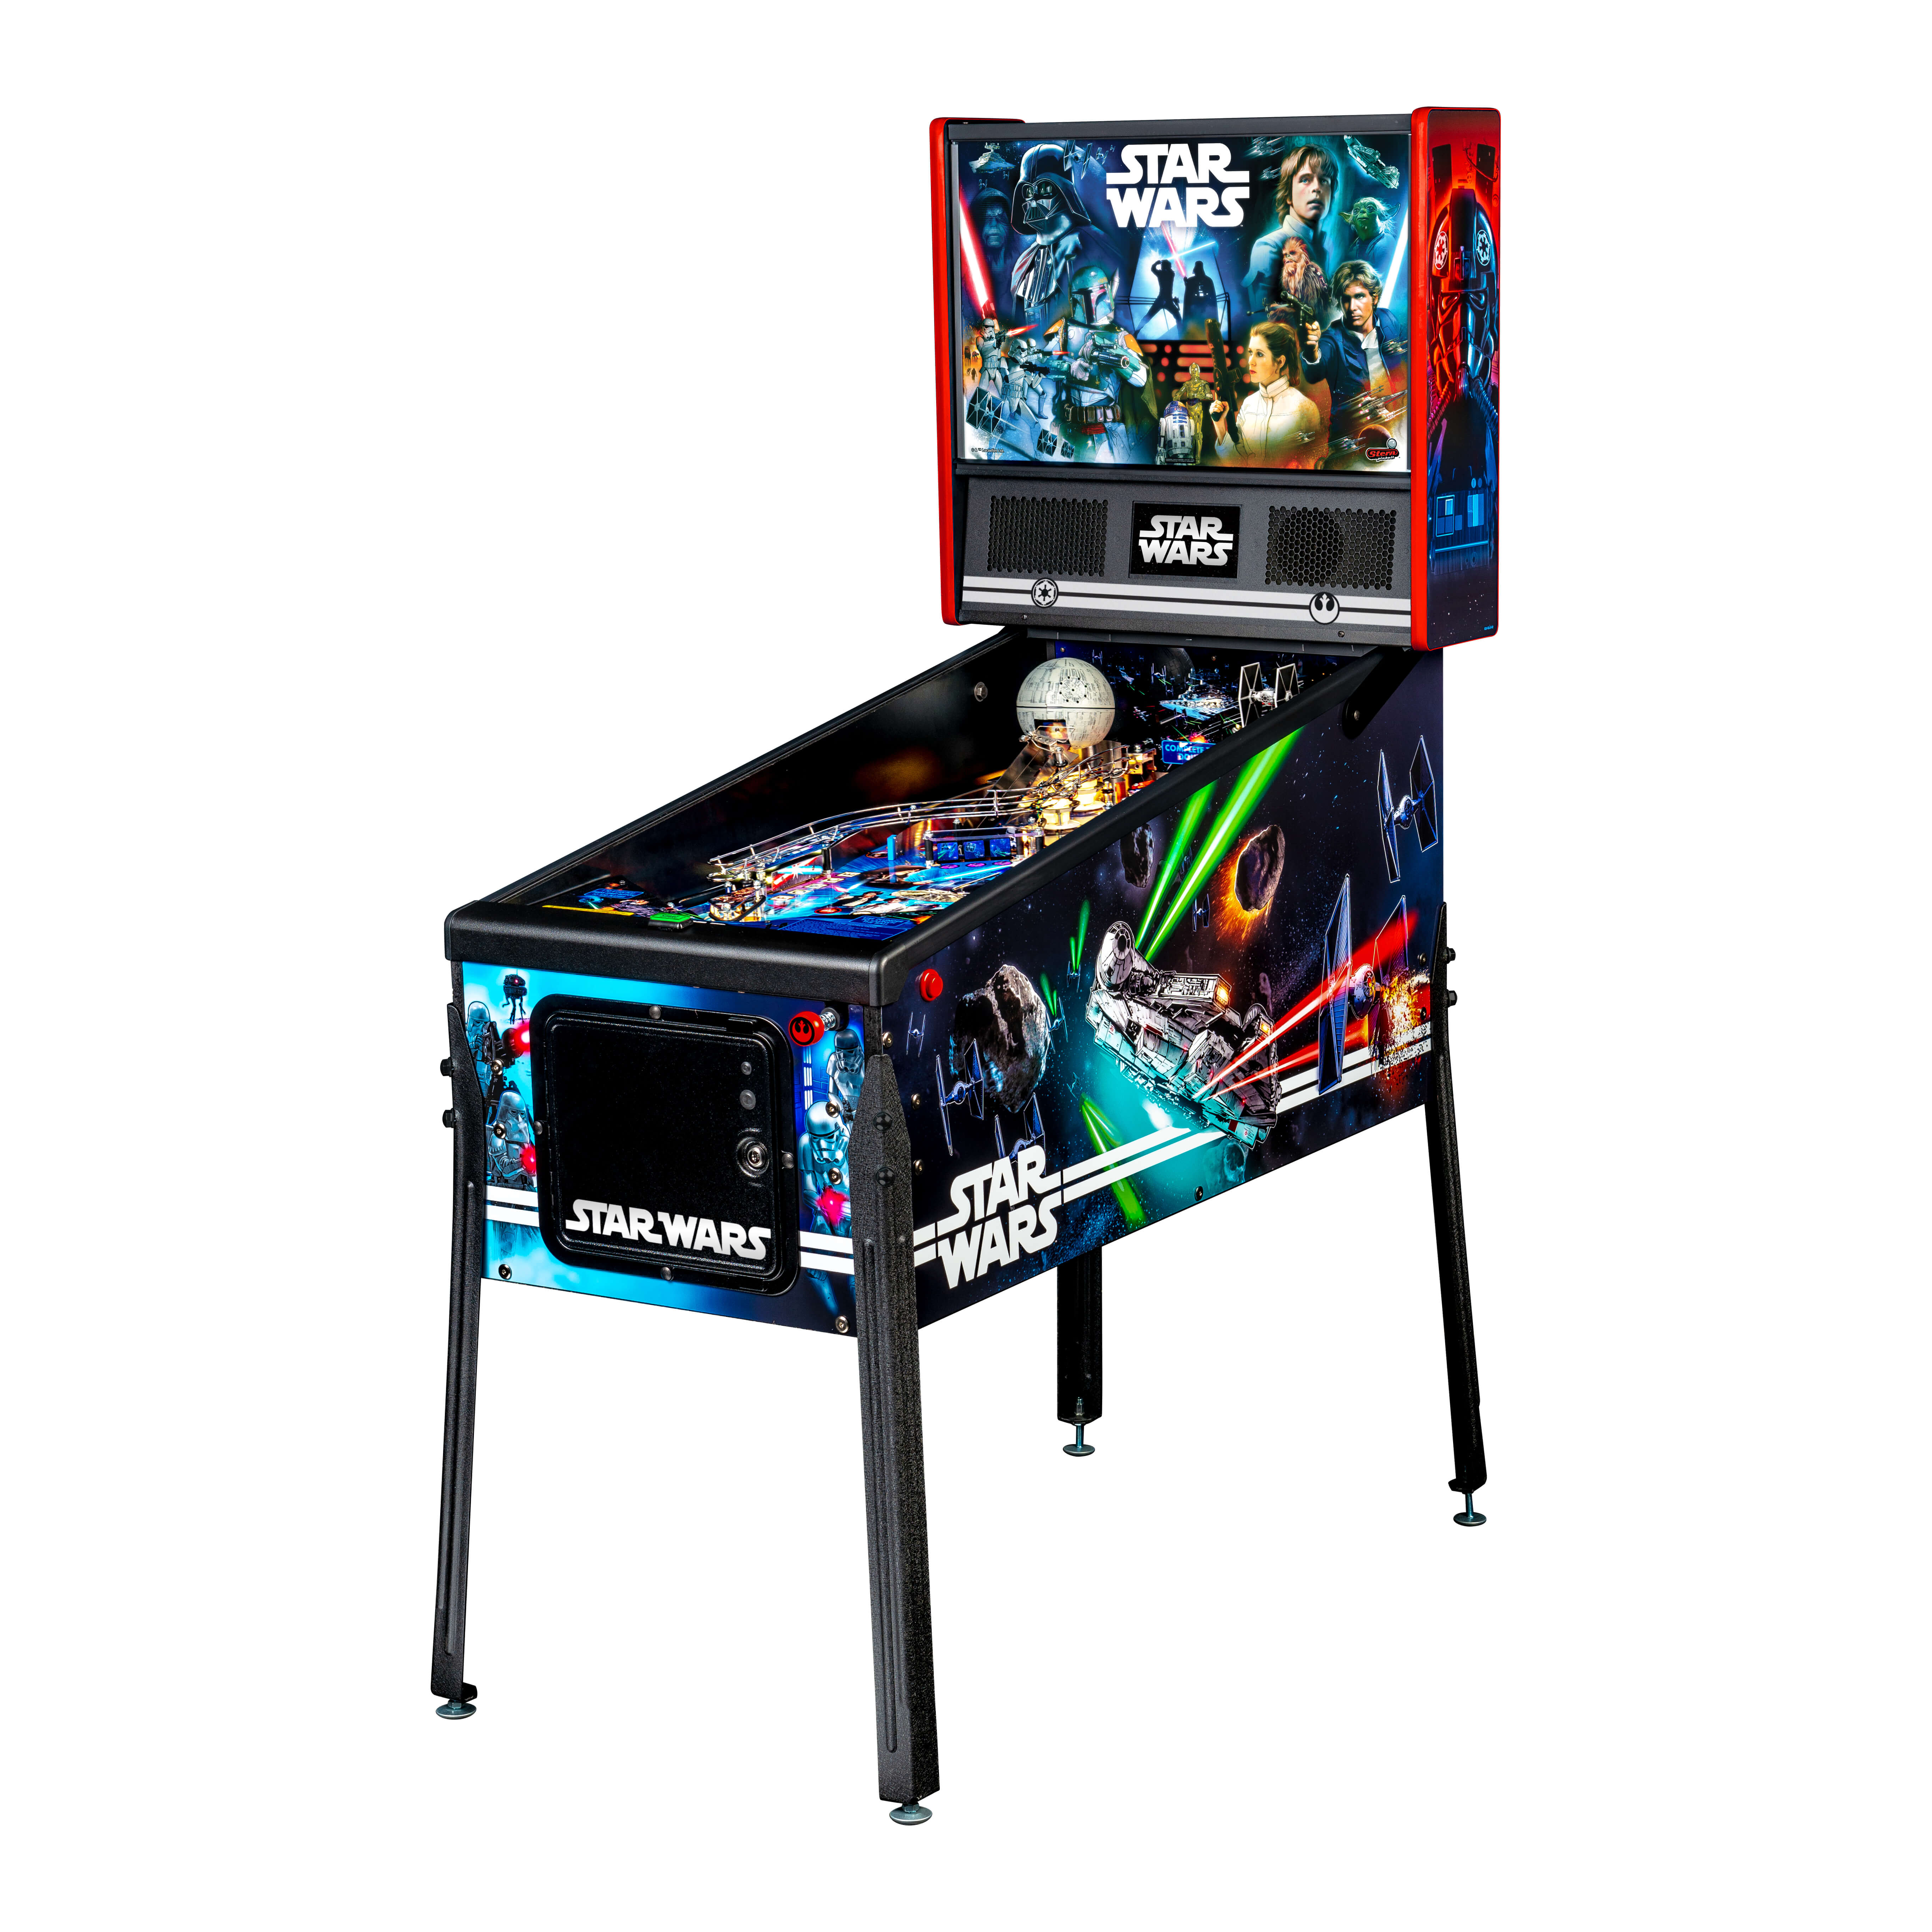 Star Wars Pinball Machine >> Star Wars Pinball Machine